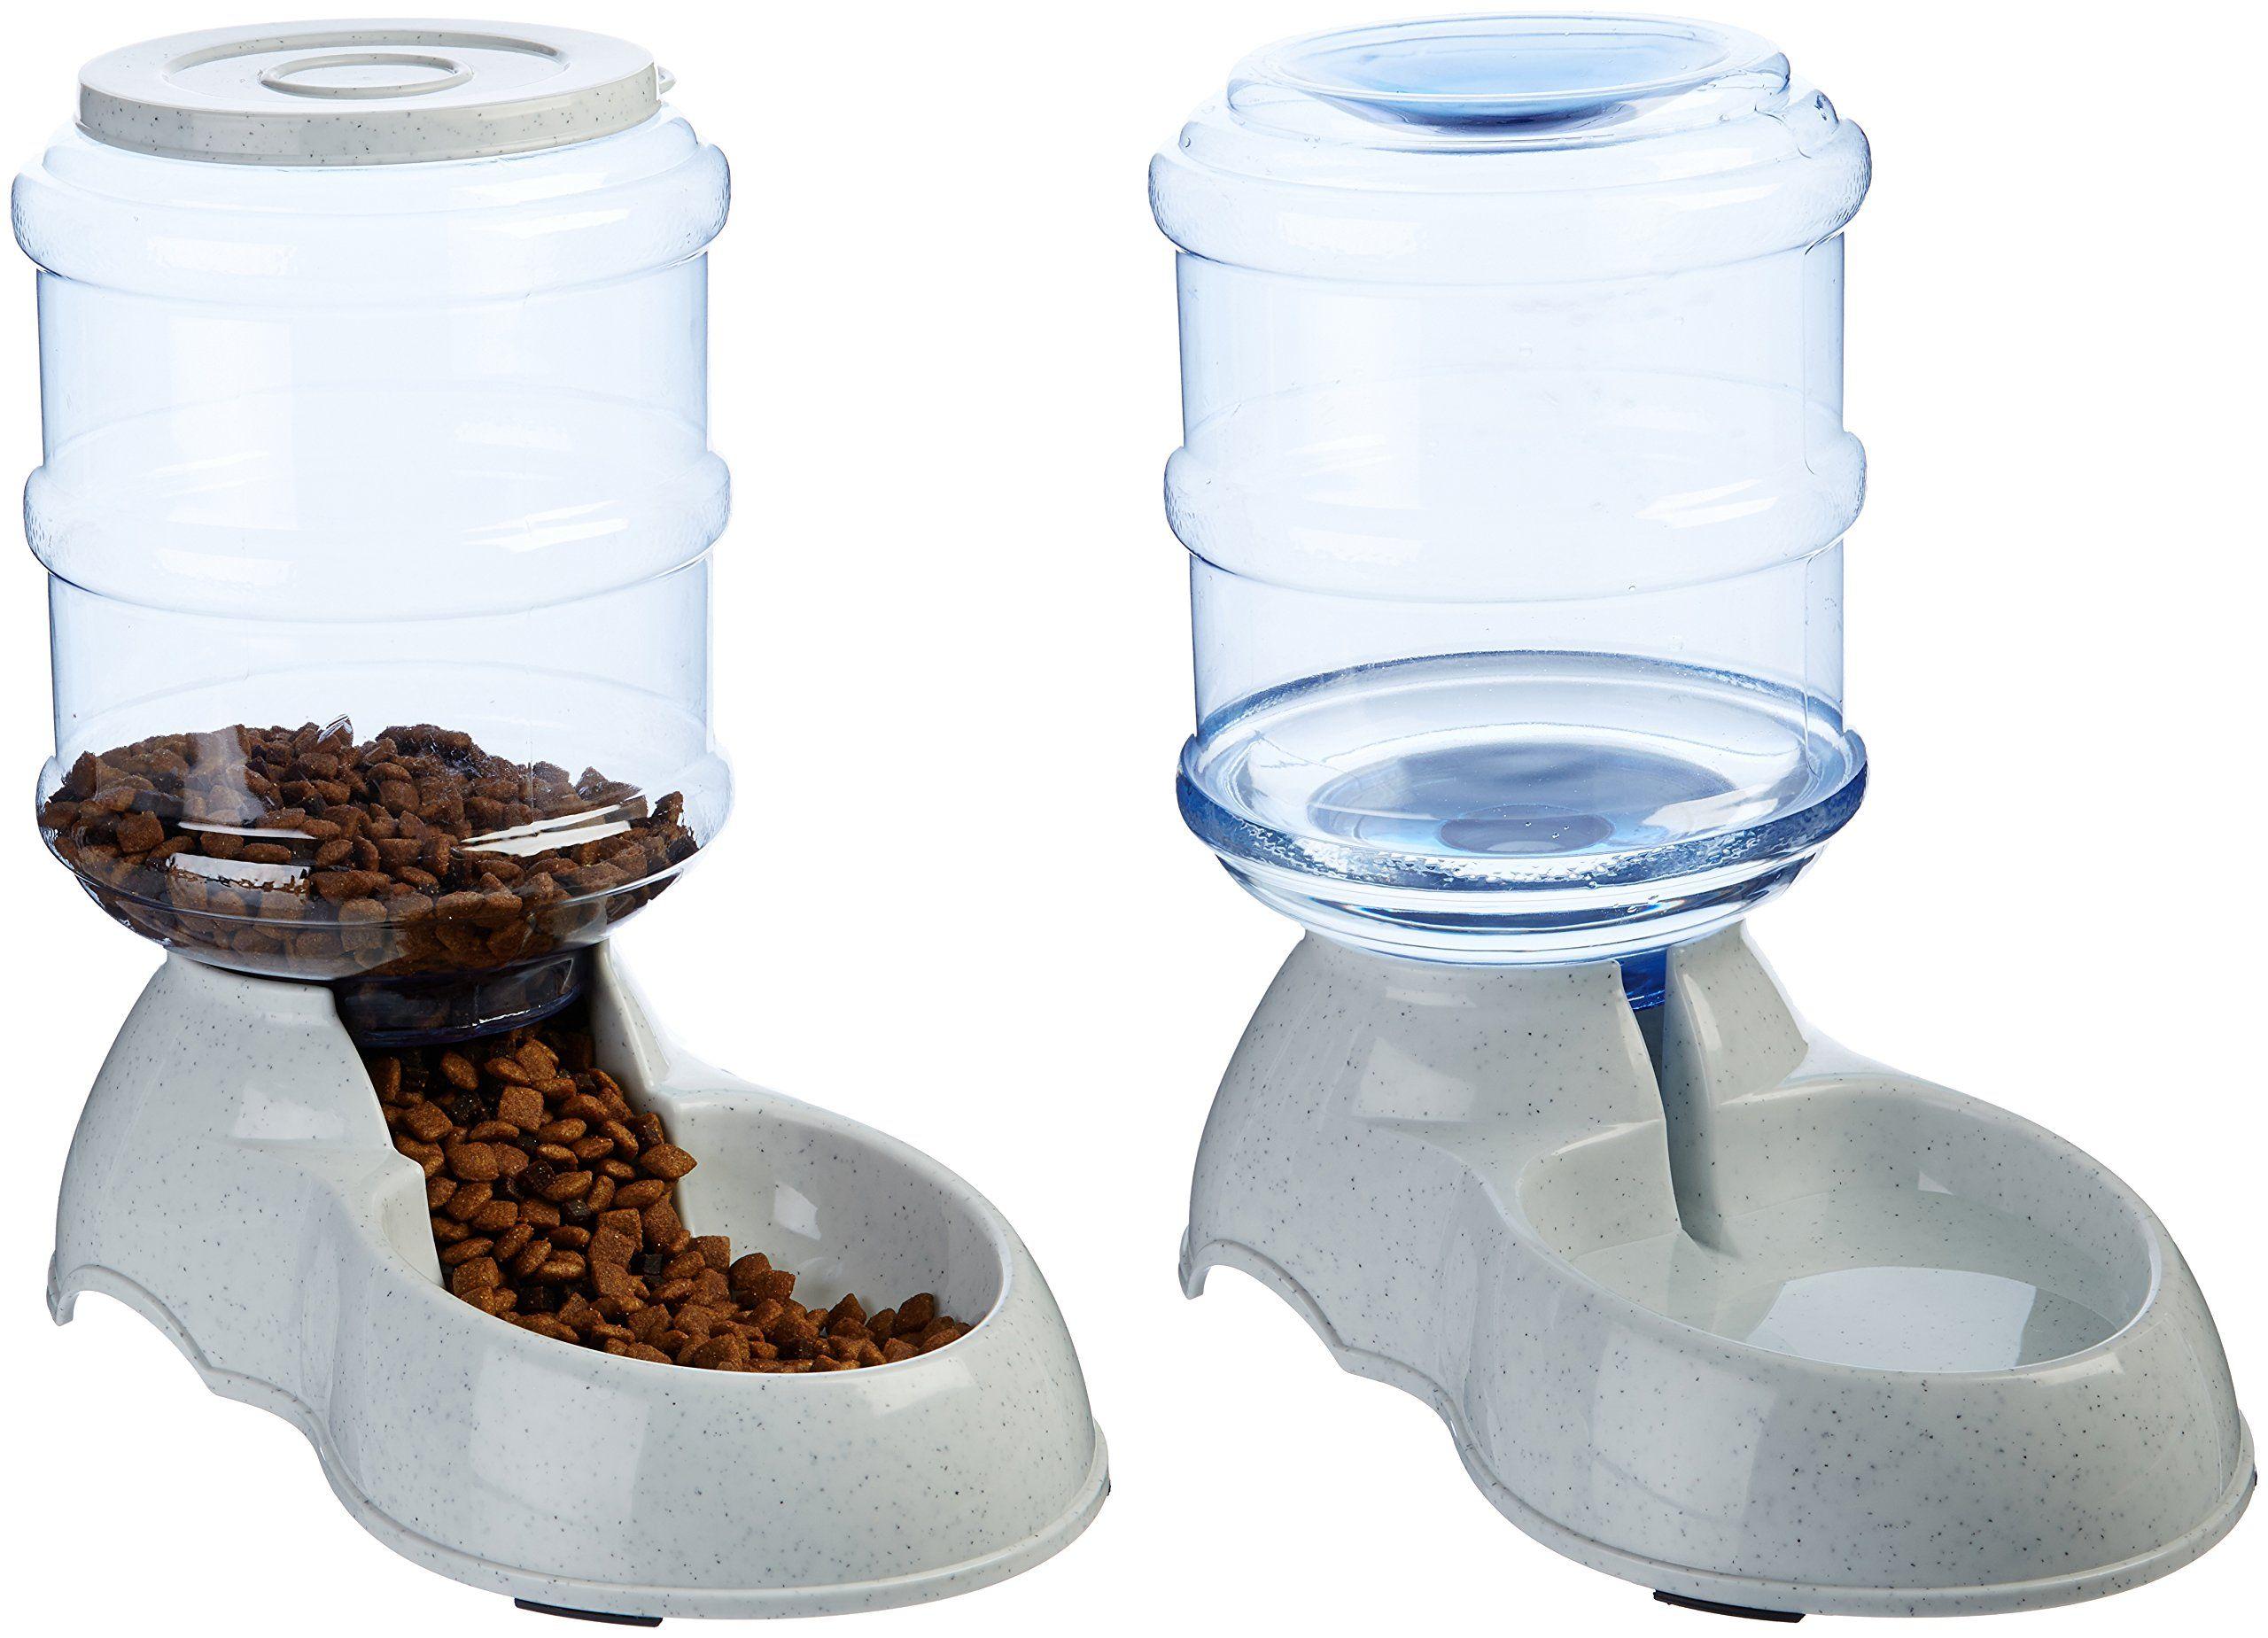 Amazonbasics gravity pet feeder and waterer bundle small